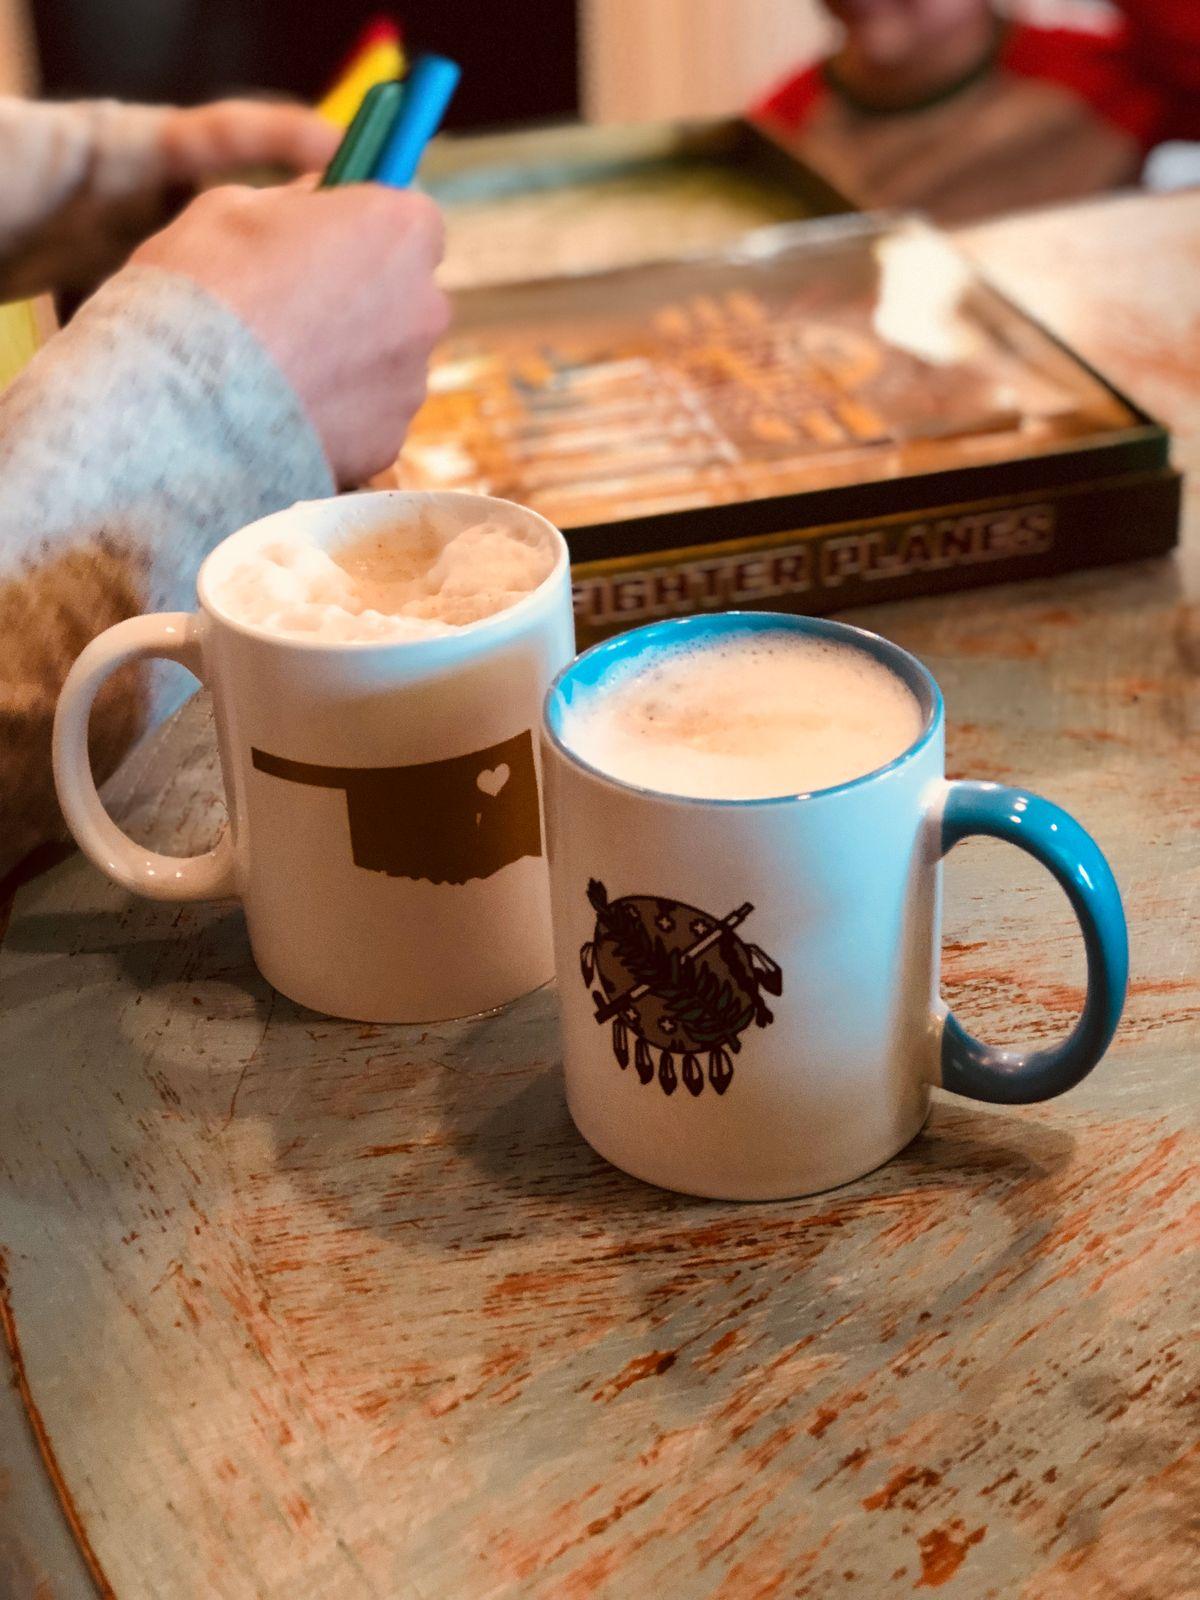 How Coffee Brings People Together